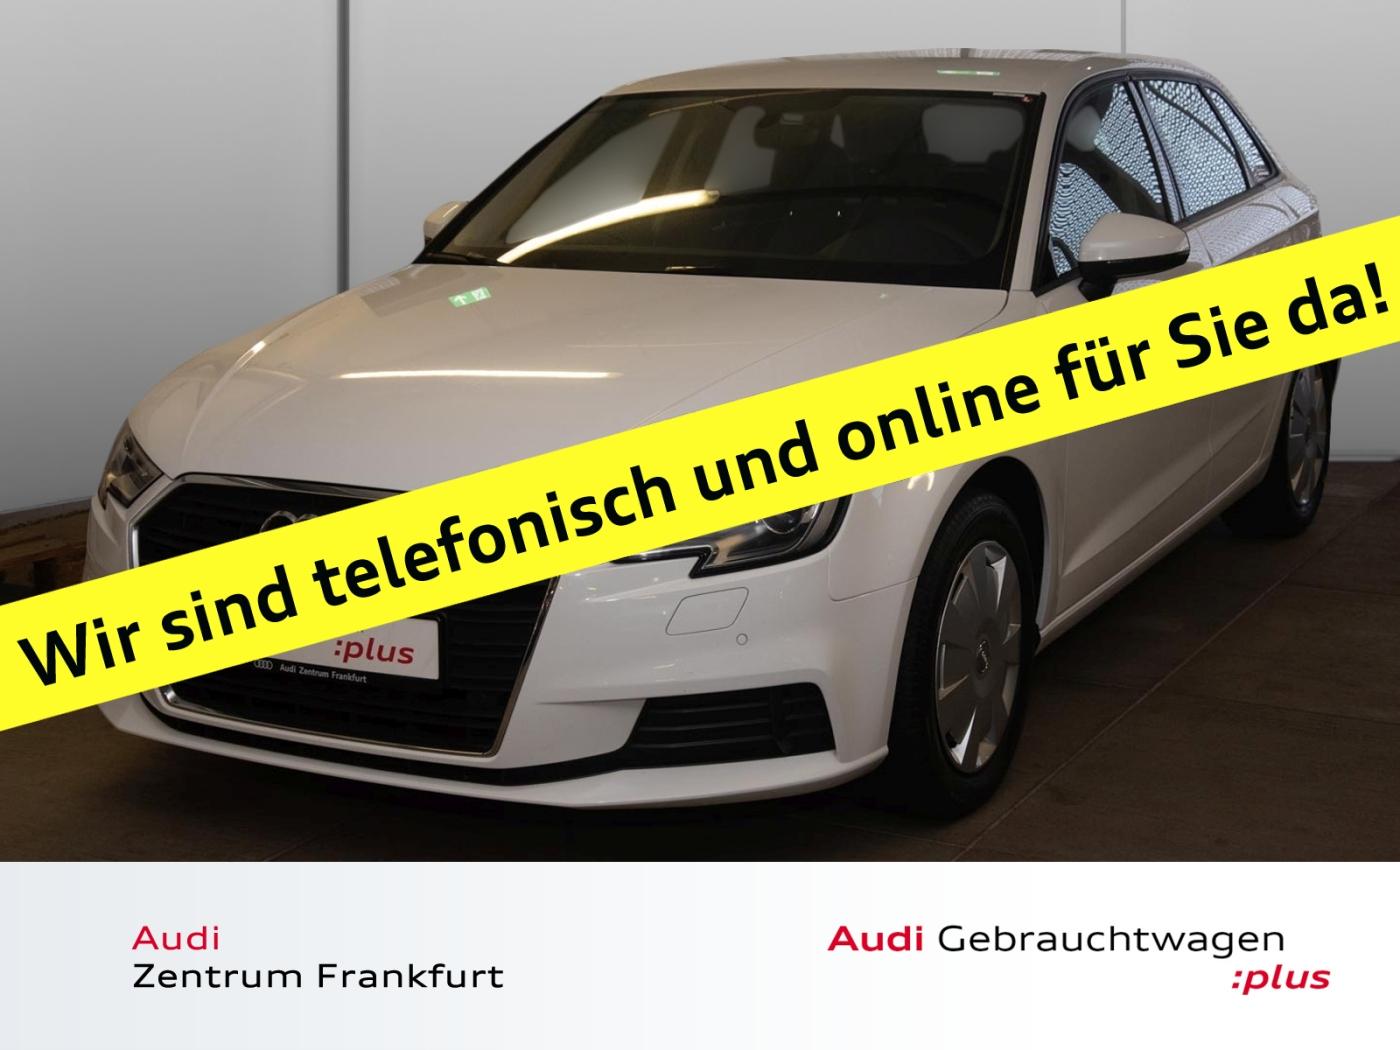 Audi A3 Sportback 2.0 TDI Navi Xenon PDC Sitzheizung, Jahr 2017, Diesel